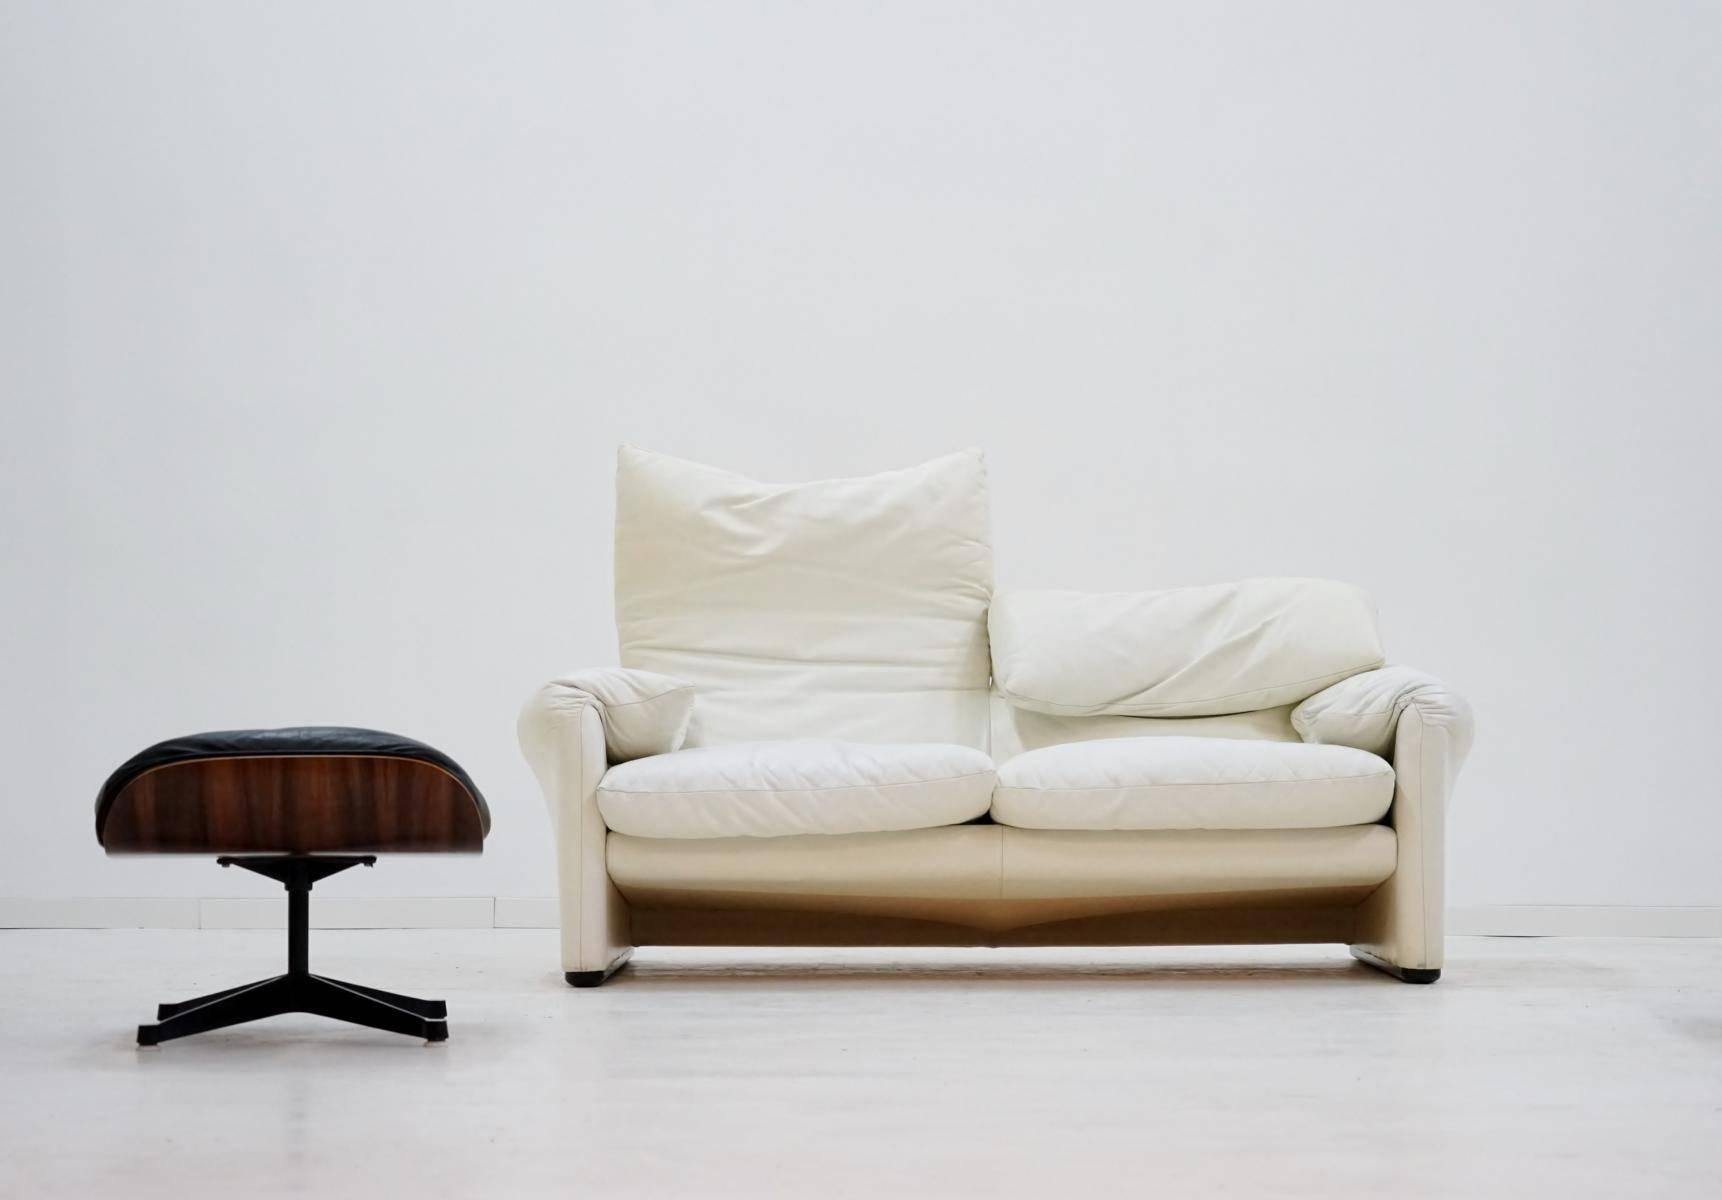 Two Seat Maralunga Cassina Vico Magestretti Design Function Canape